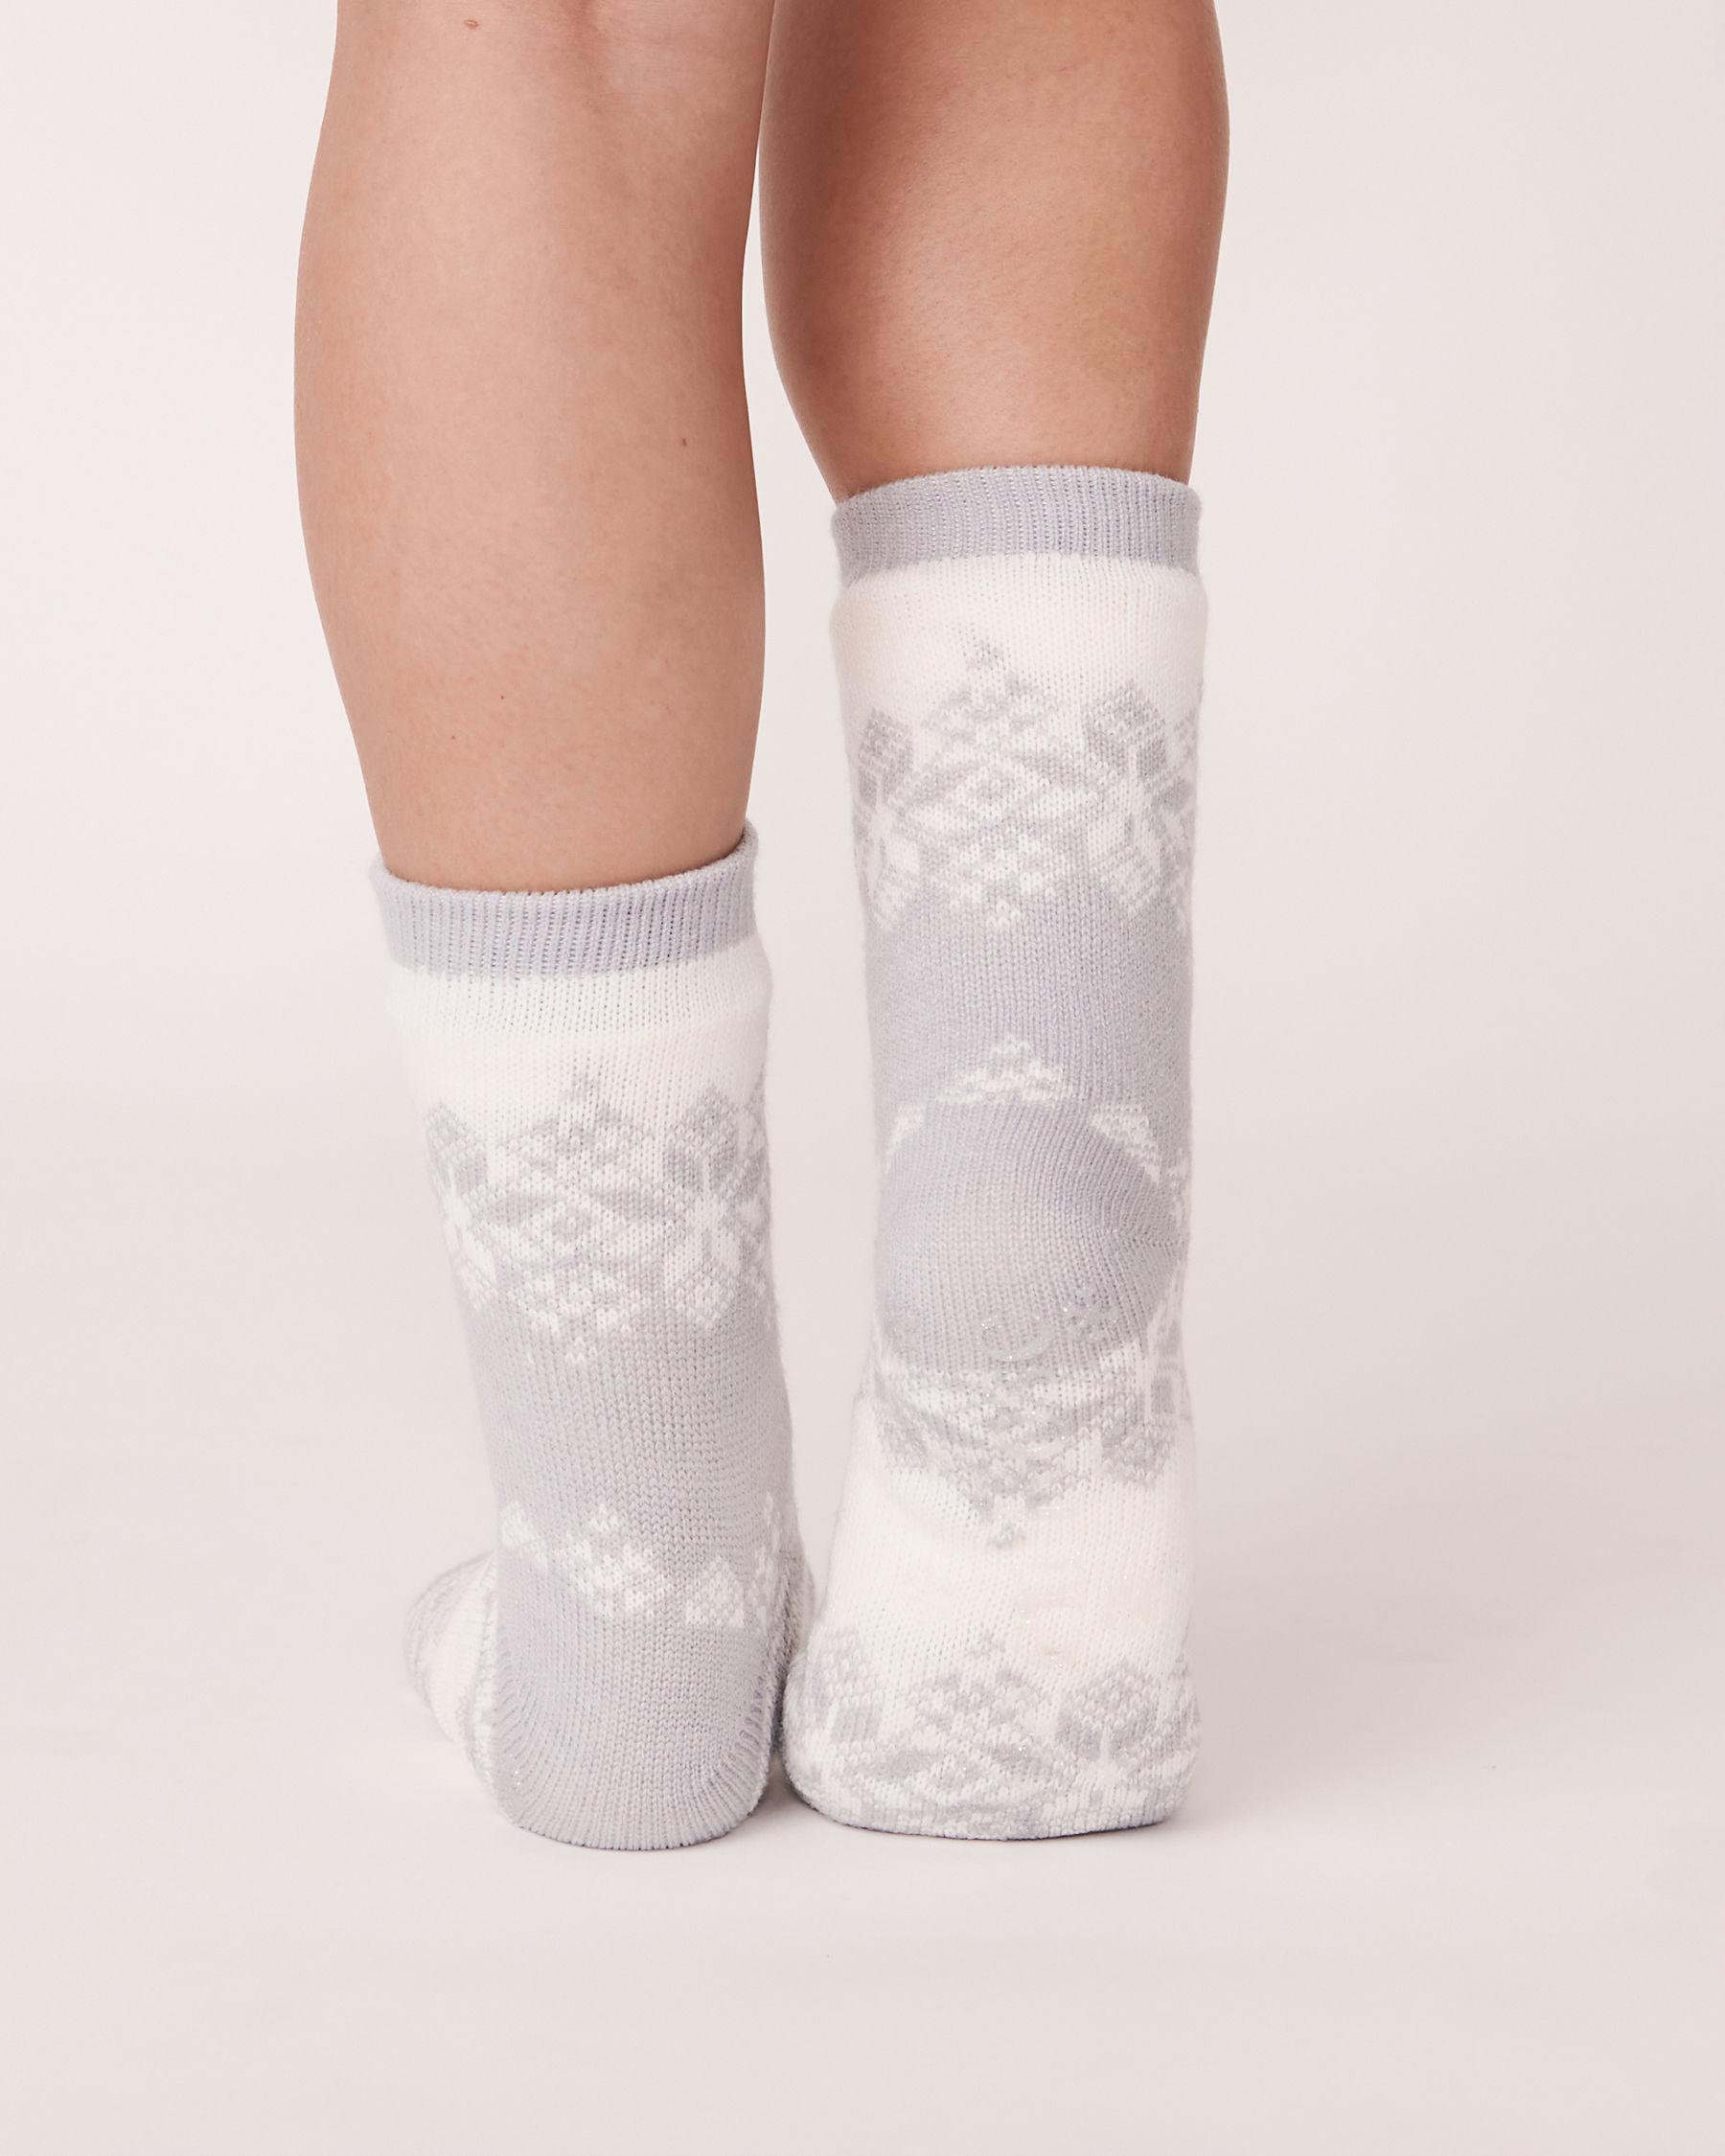 LA VIE EN ROSE Nordic Print Knit and Sherpa Socks Grey winter 554-514-0-09 - View2